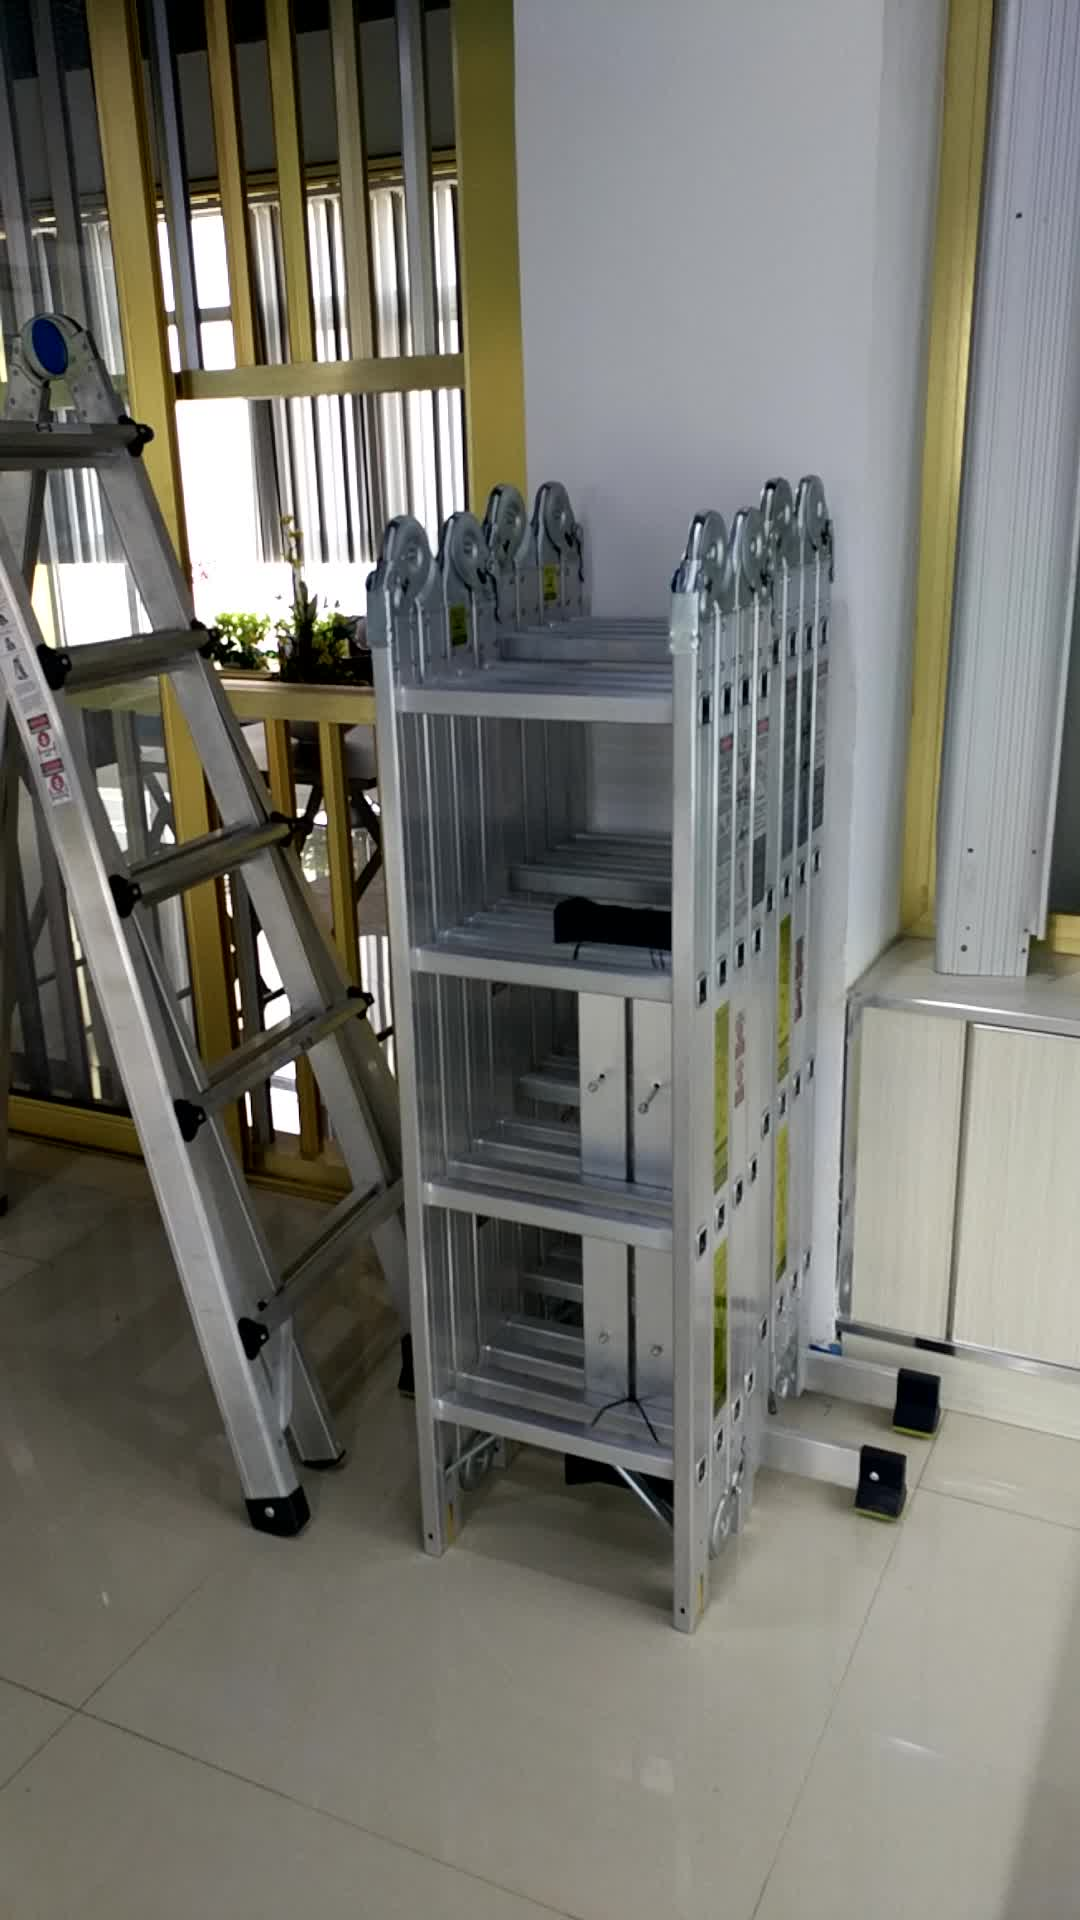 China Manufacturer Multi Purpose Aluminum Ladder Folding